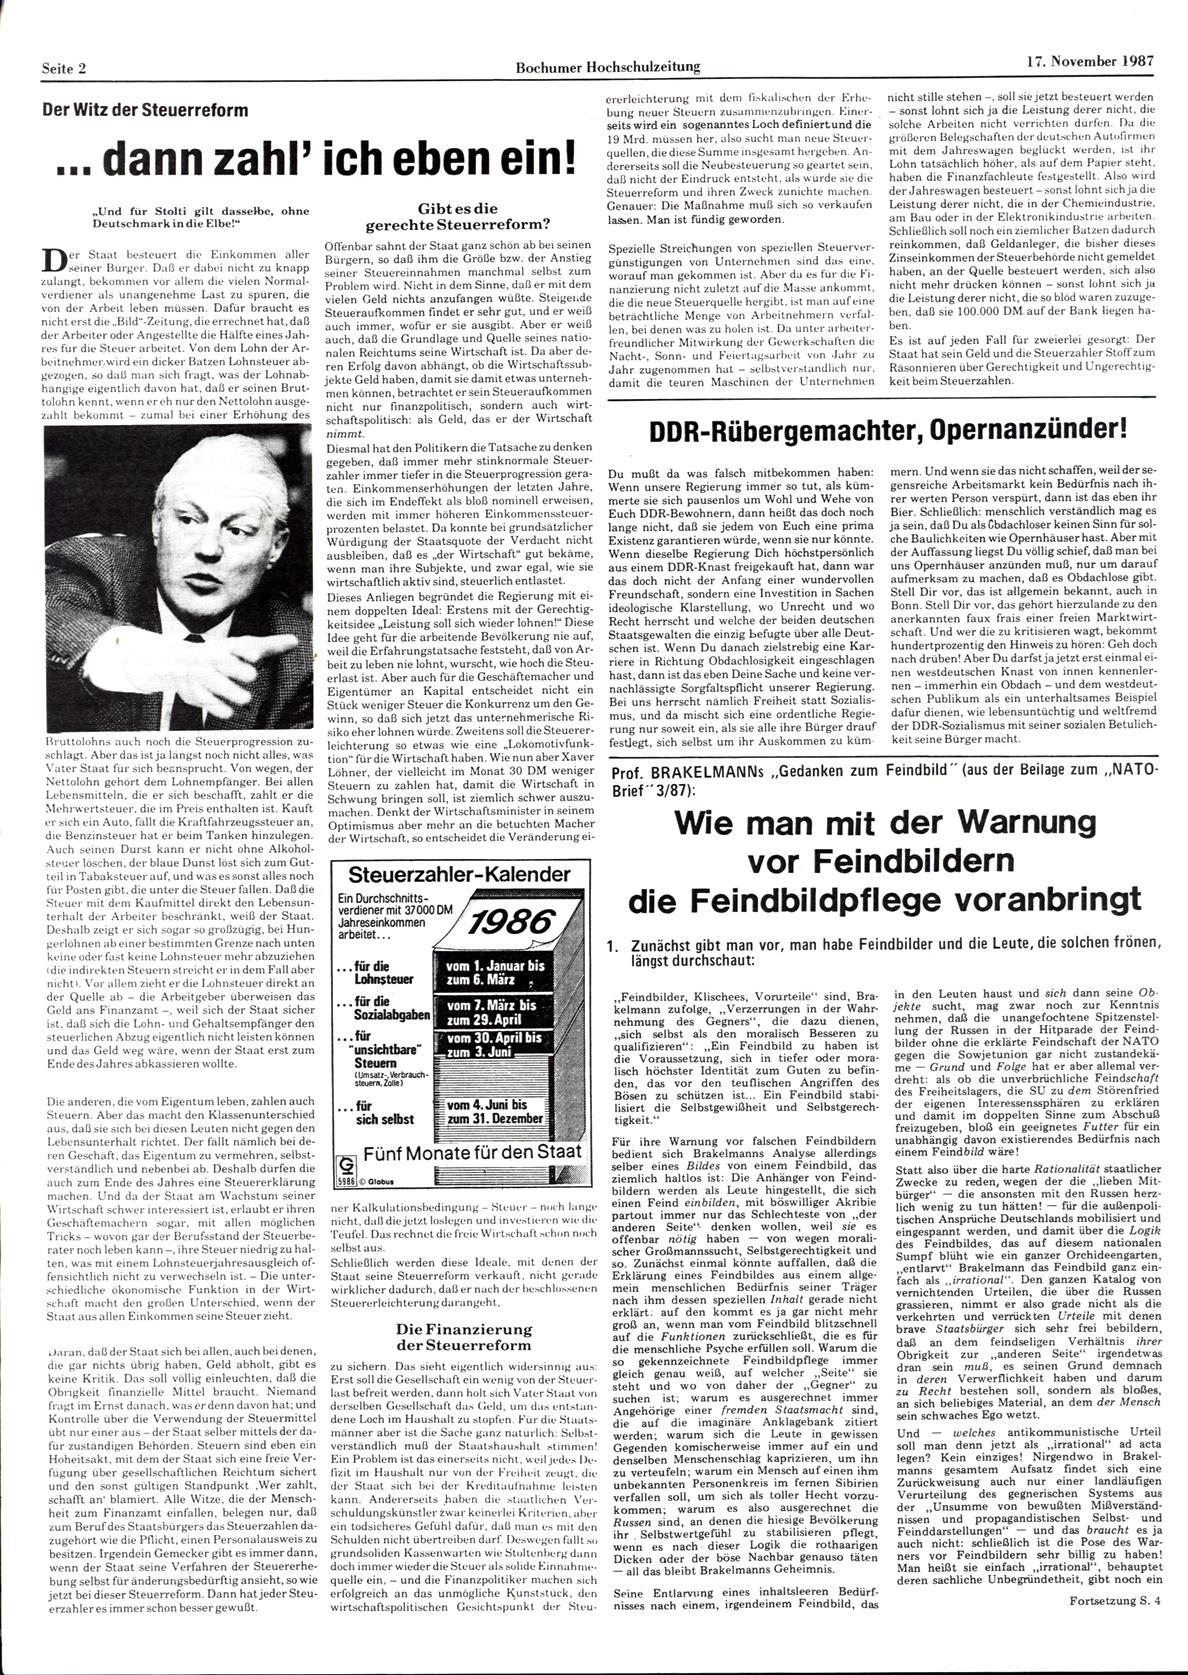 Bochum_BHZ_19871117_159_002